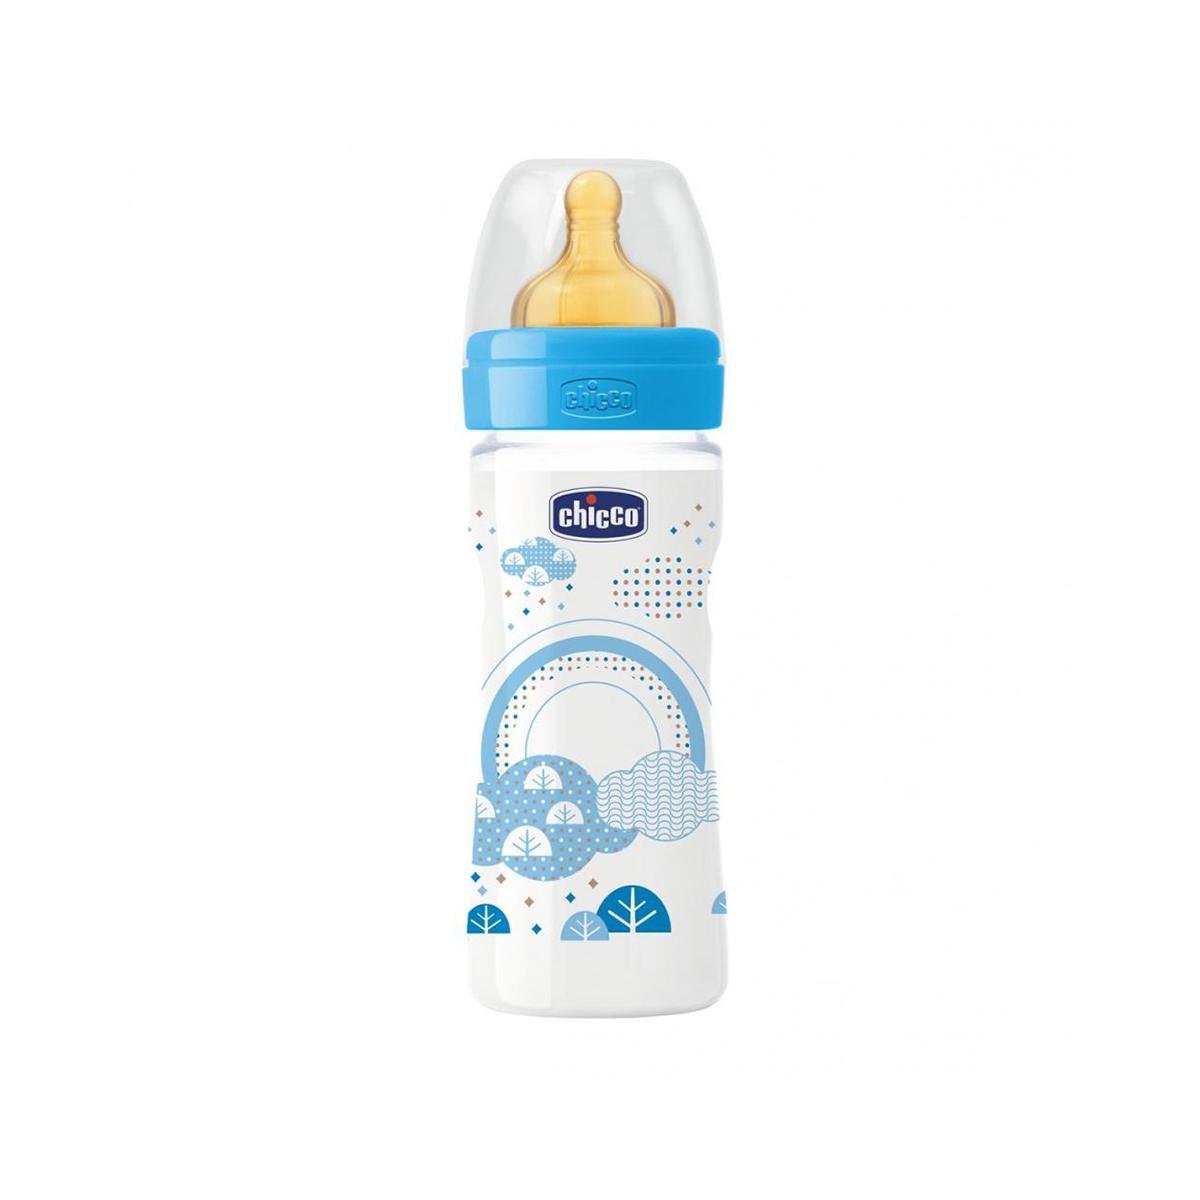 Biberon Wellbeing PP Chicco, 250 ml, 2 luni +, Albastru imagine